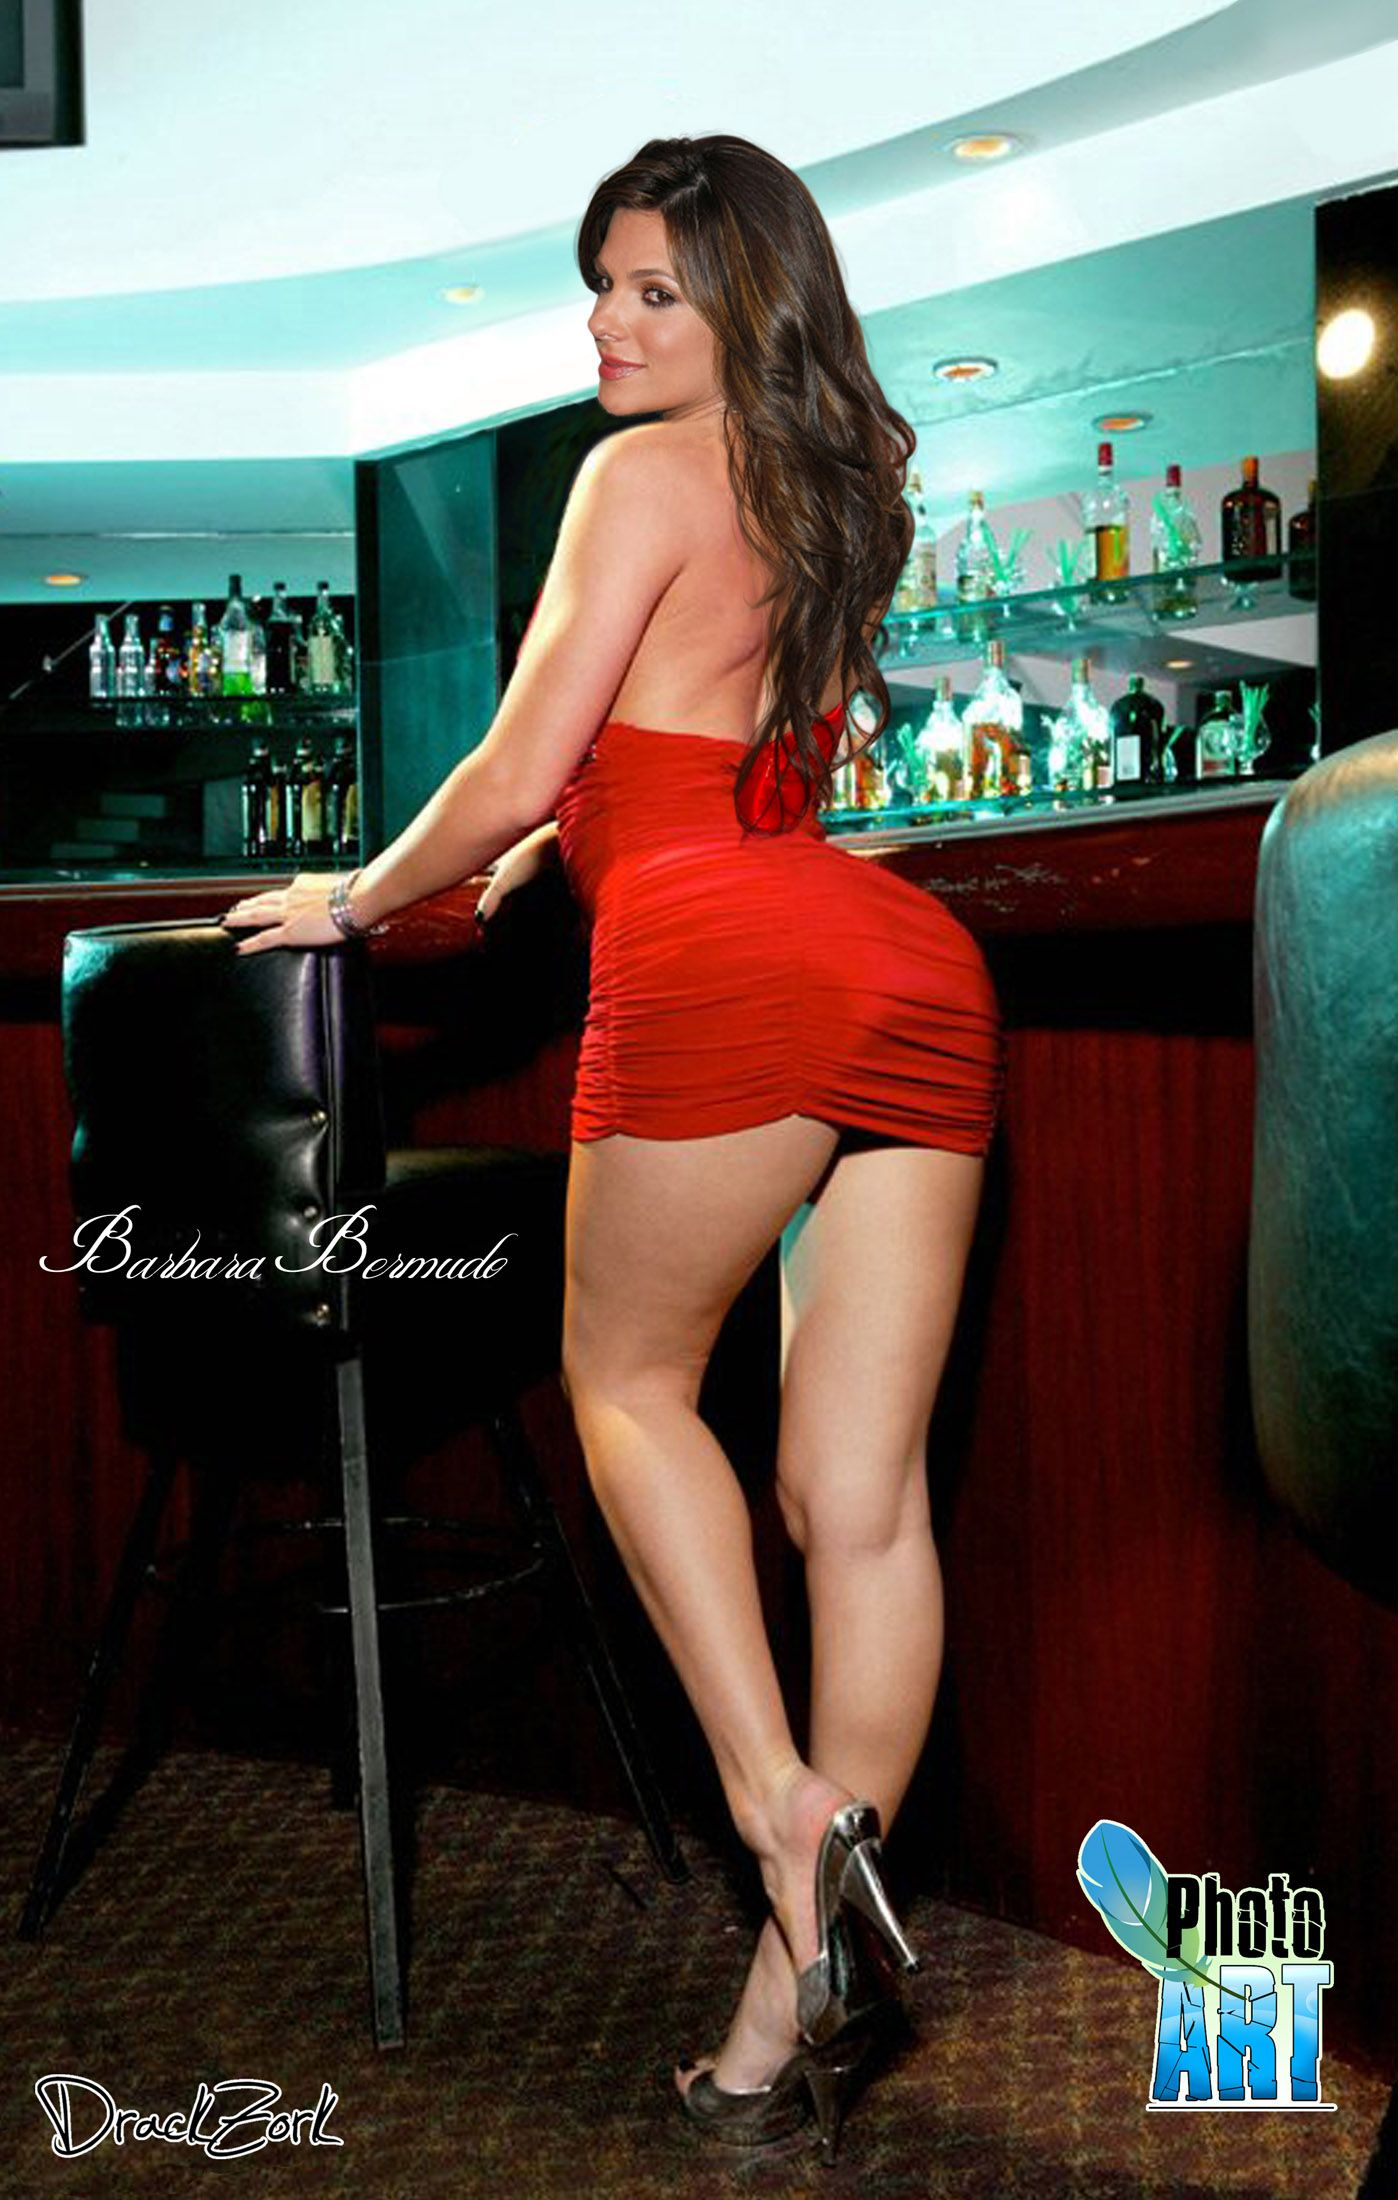 Barbara bermudo xxx, leah garcia naked